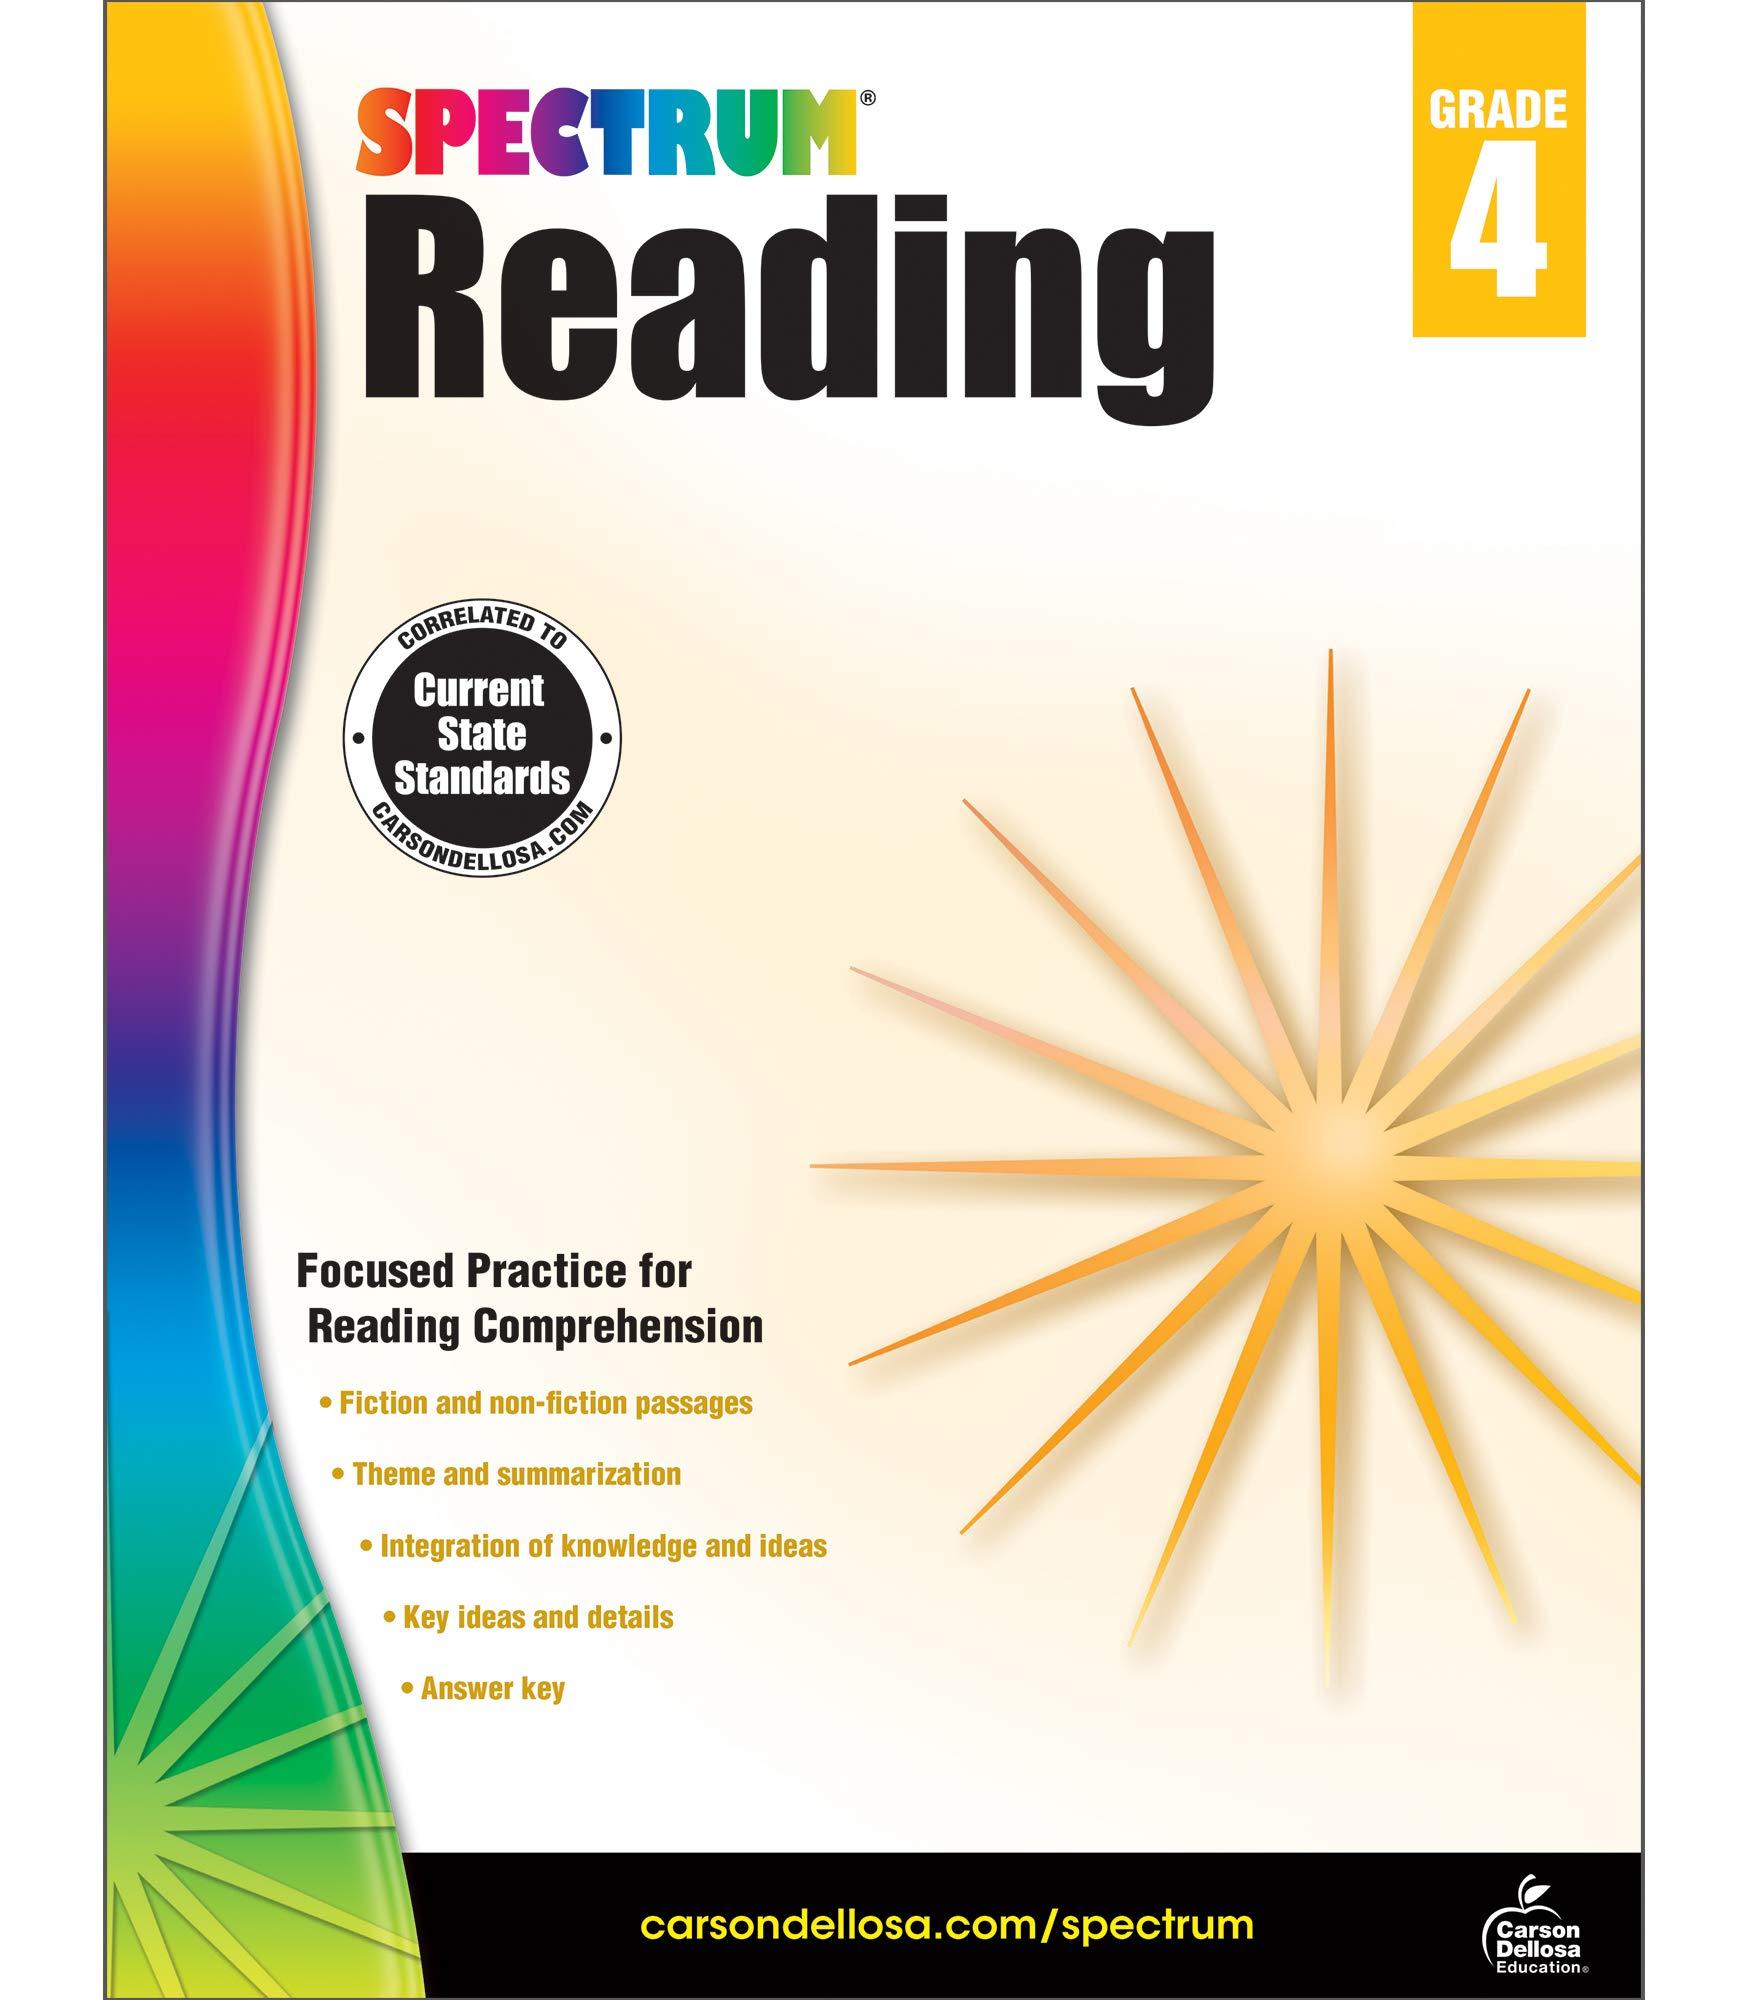 - Spectrum Reading Workbook 4th Grade, 174pgs - Buy Online In